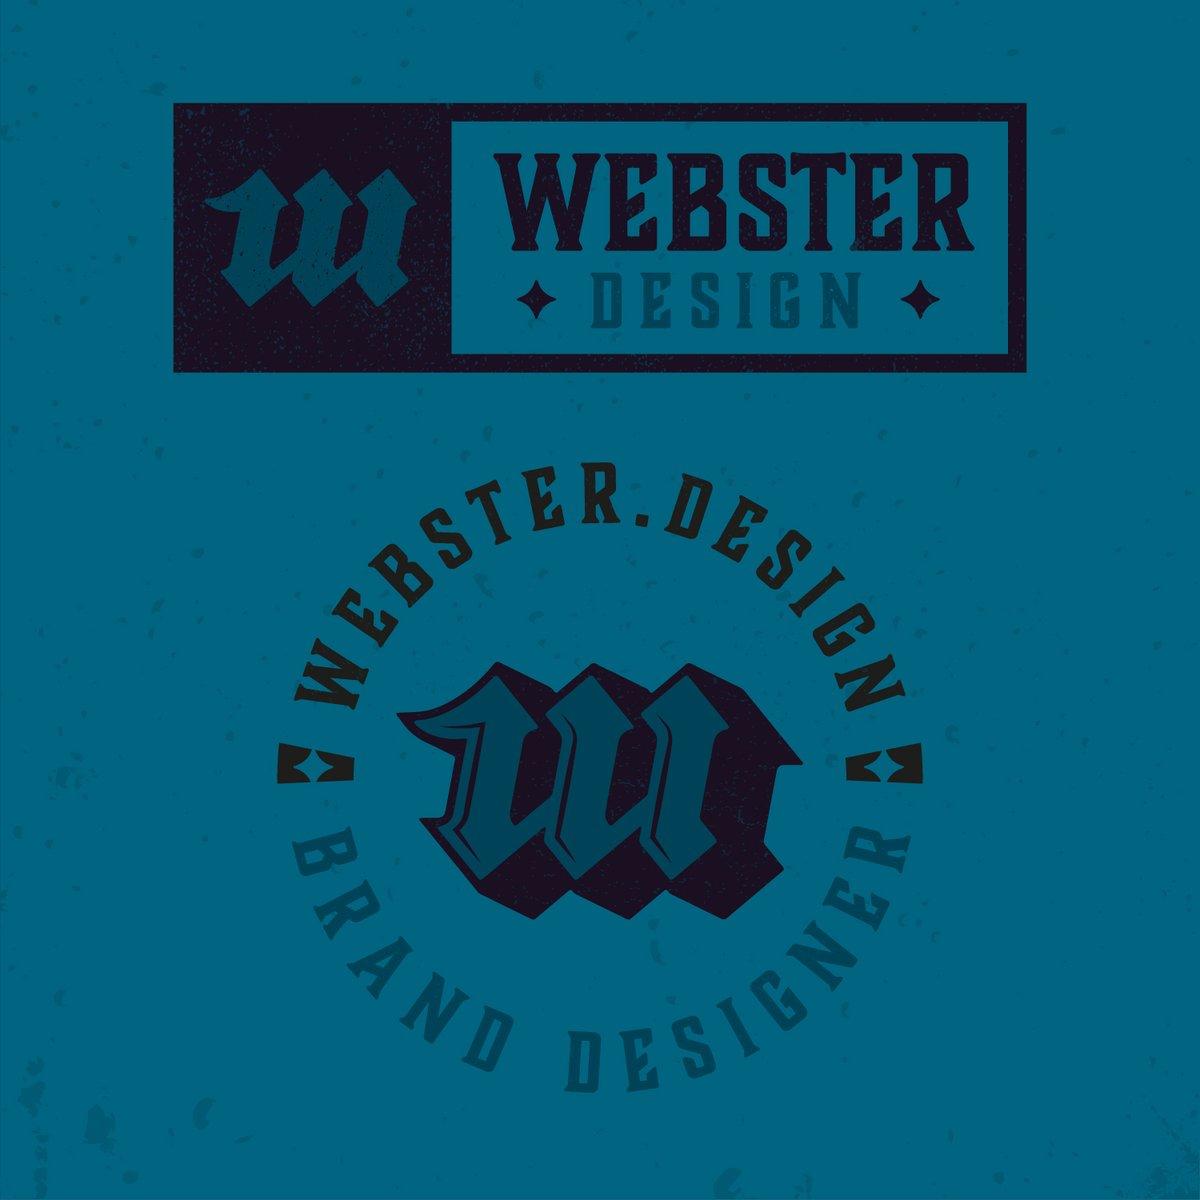 Webster Design 2020...  #GraphicDesign #BrandDesign pic.twitter.com/CpuJUTQvlw